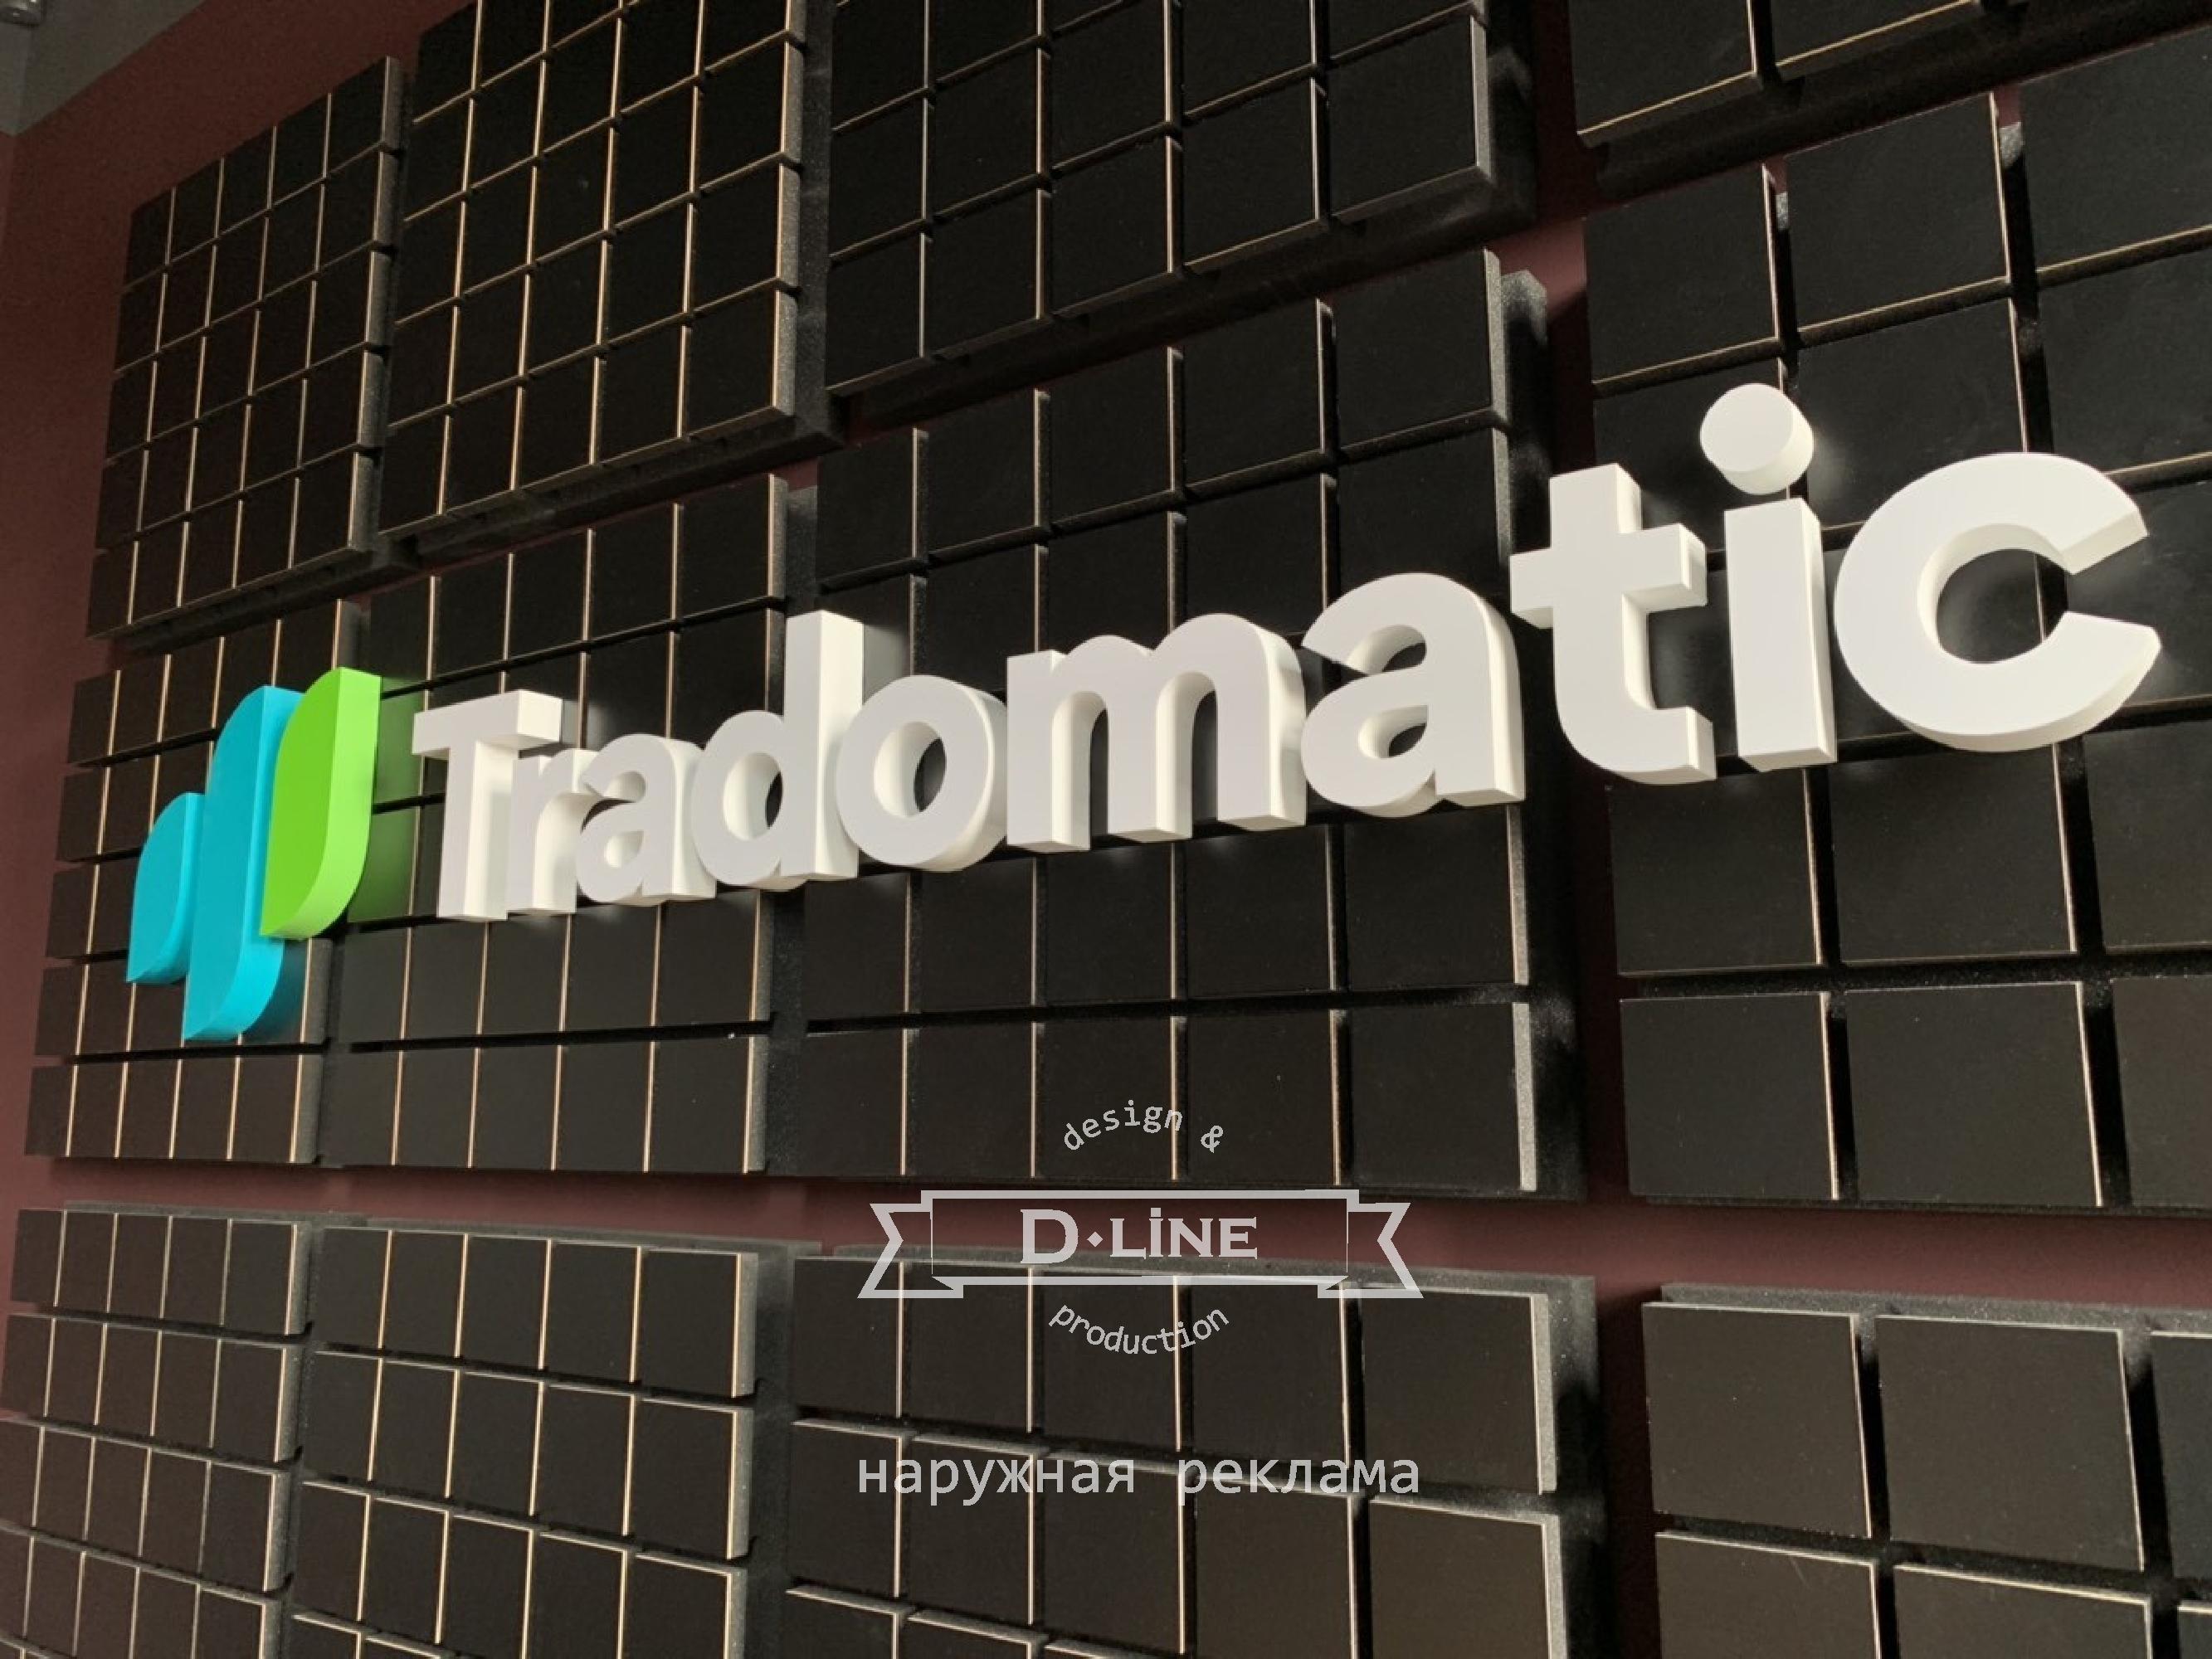 Tradomatic8